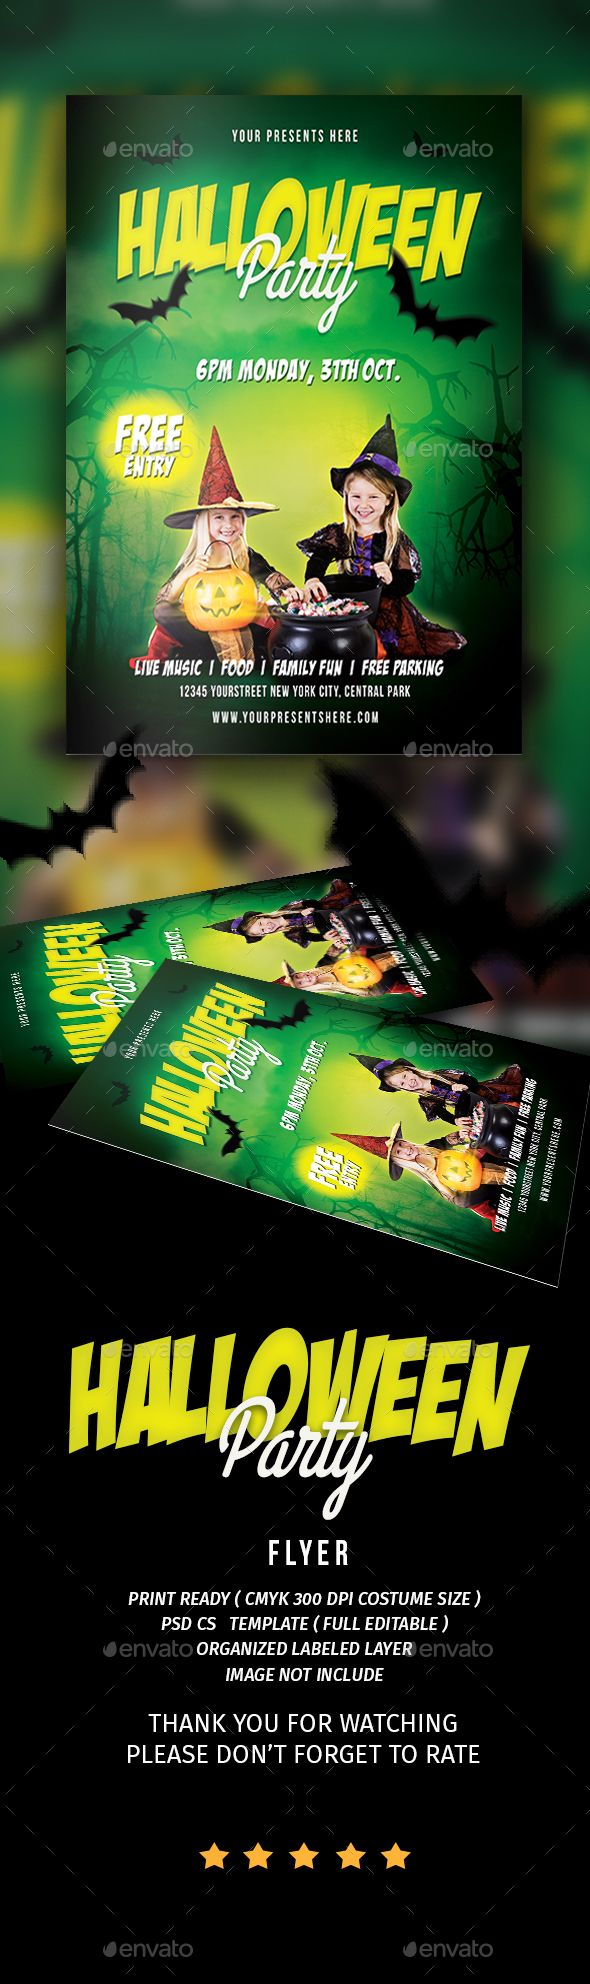 halloween party flyer pinterest halloween party flyer party